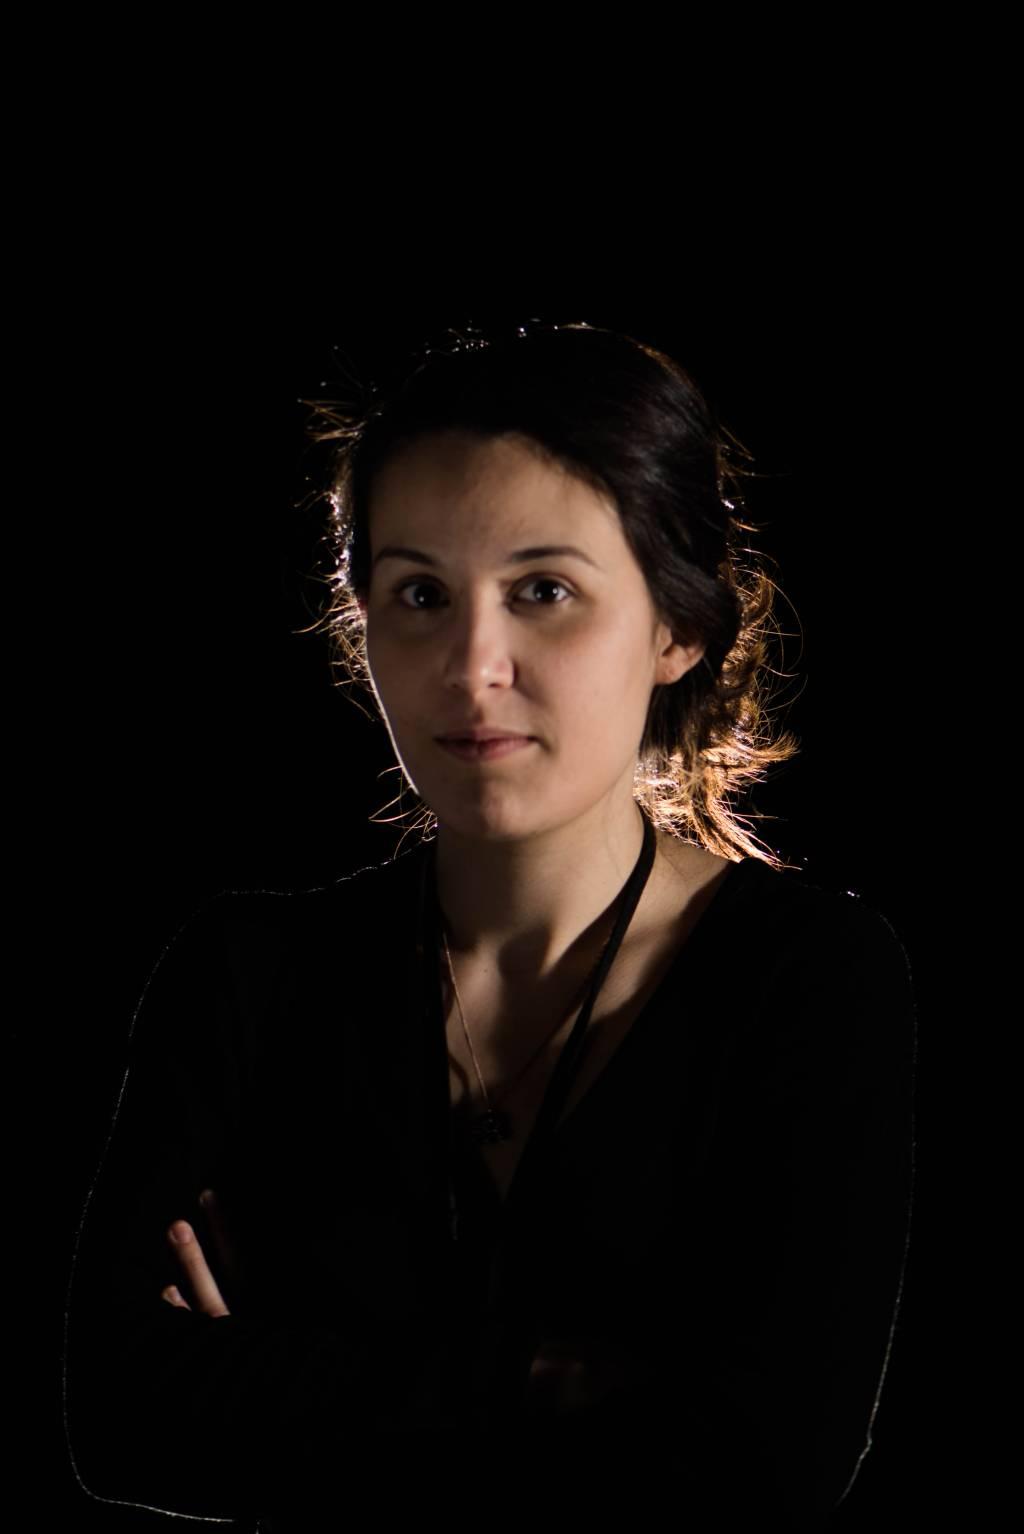 Laura Goncalves Ribeiro 3D Media Group Tampere University